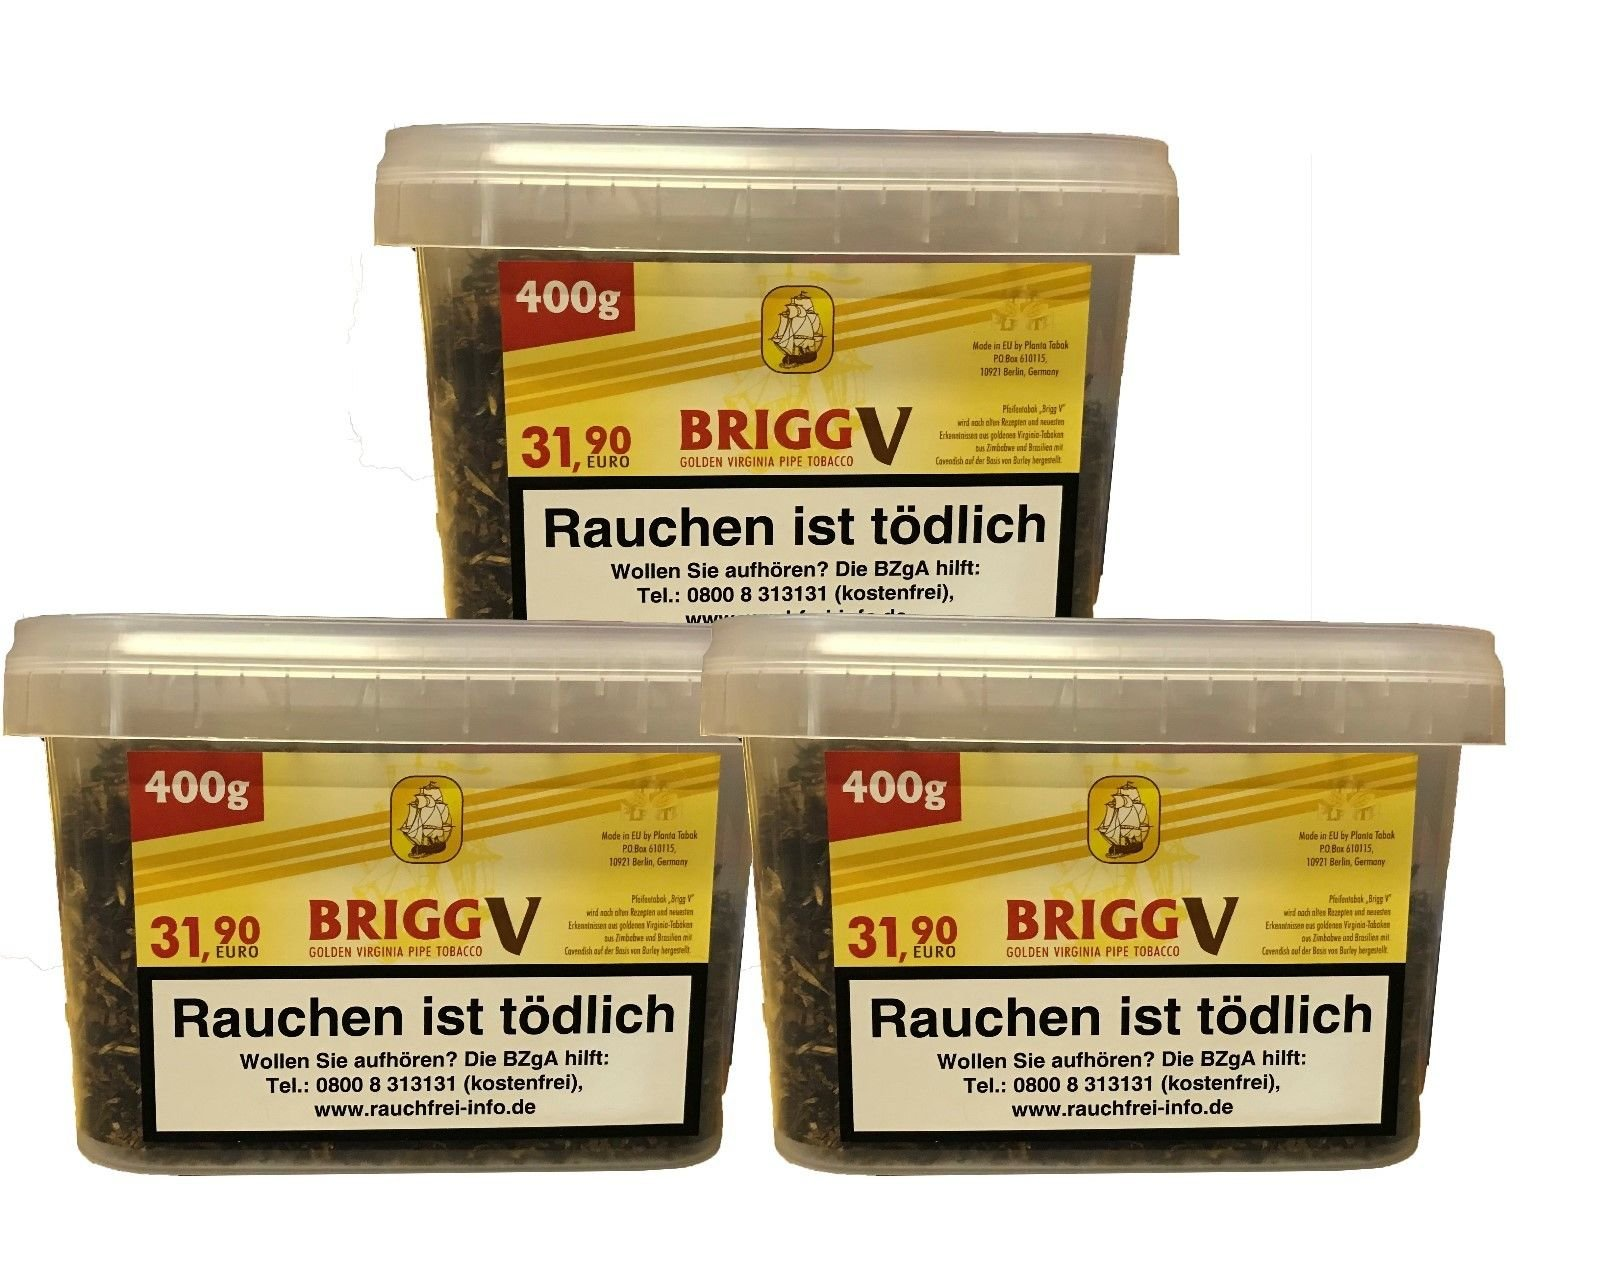 3x Brigg V Eimer Pfeifentabak à 400 g (Golden Virginia Tabak mit Vanille Aroma)